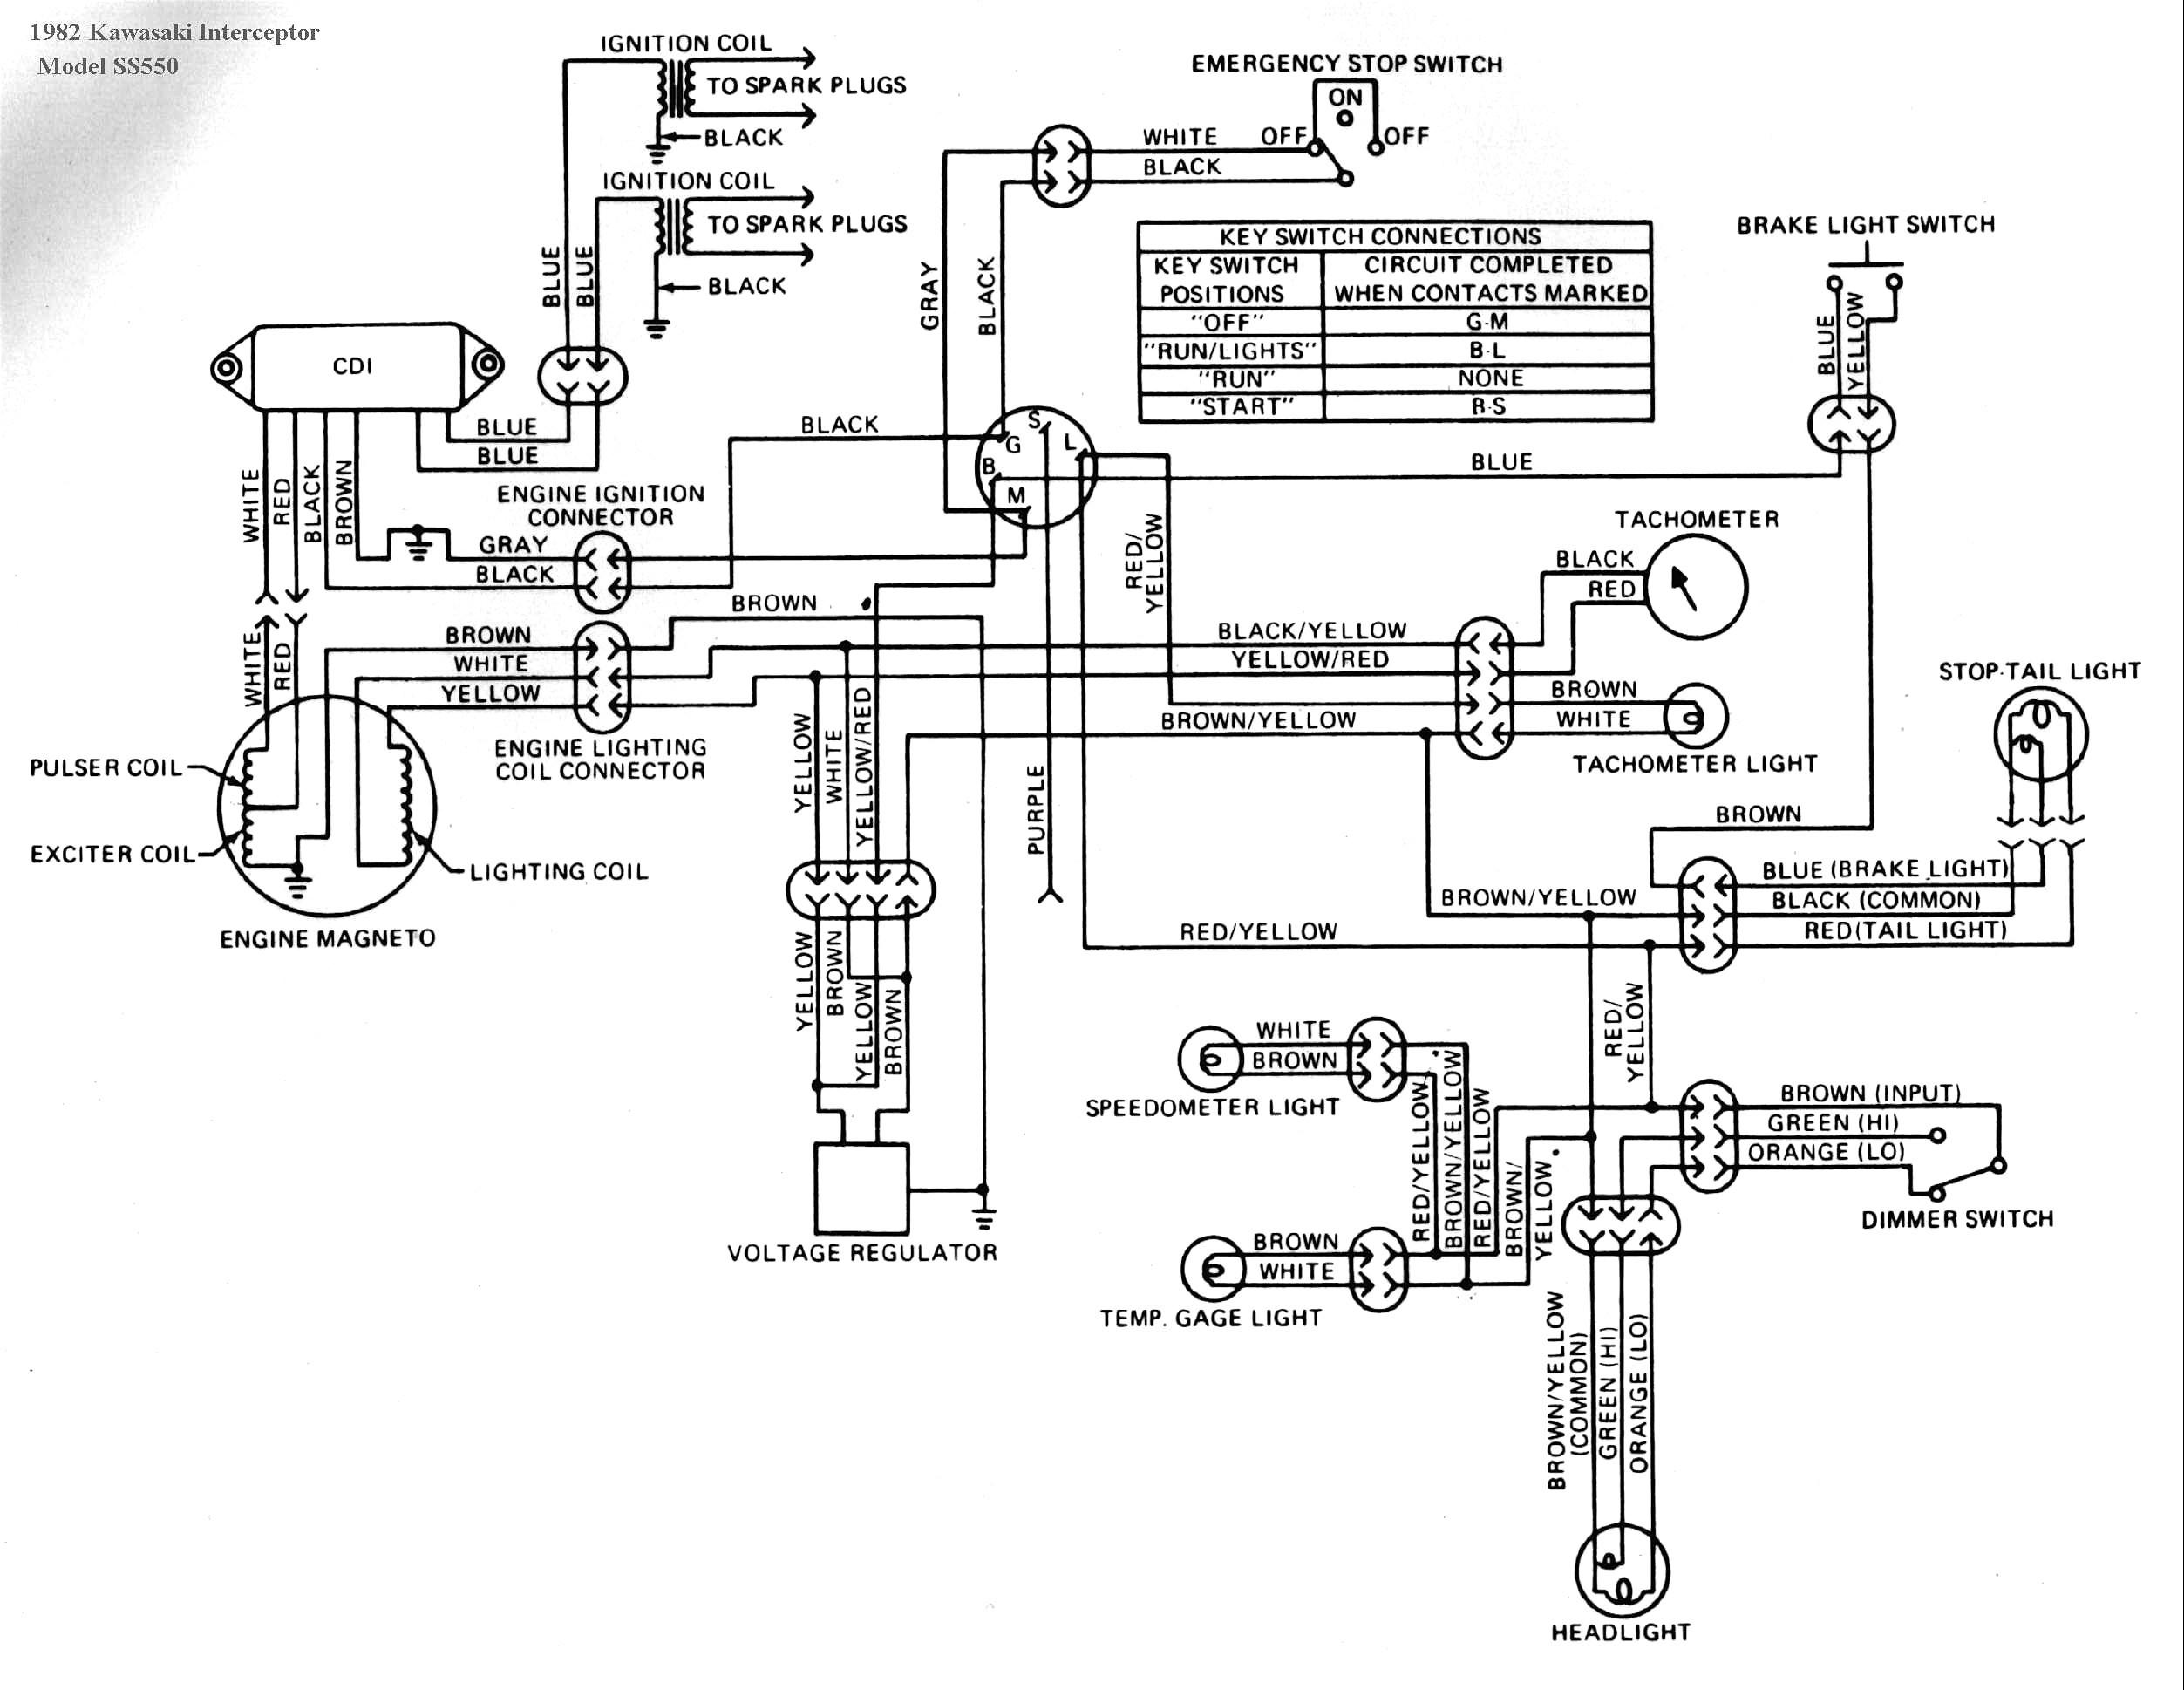 Kawasaki 750ss Wiring Diagram | Wiring Diagram Centre on kawasaki 300 wiring diagram, kawasaki fire sprint wiring schematic, kawasaki kill switch diagram, kawasaki bayou 220 wiring diagram, kawasaki ninja wiring diagram, kawasaki 400 4 wheeler wiring diagram, kawasaki 100 wiring diagram, kawasaki battery wiring diagram, kawasaki ignition coil wiring diagram, 09 kawasaki teryx headlight wiring diagram,